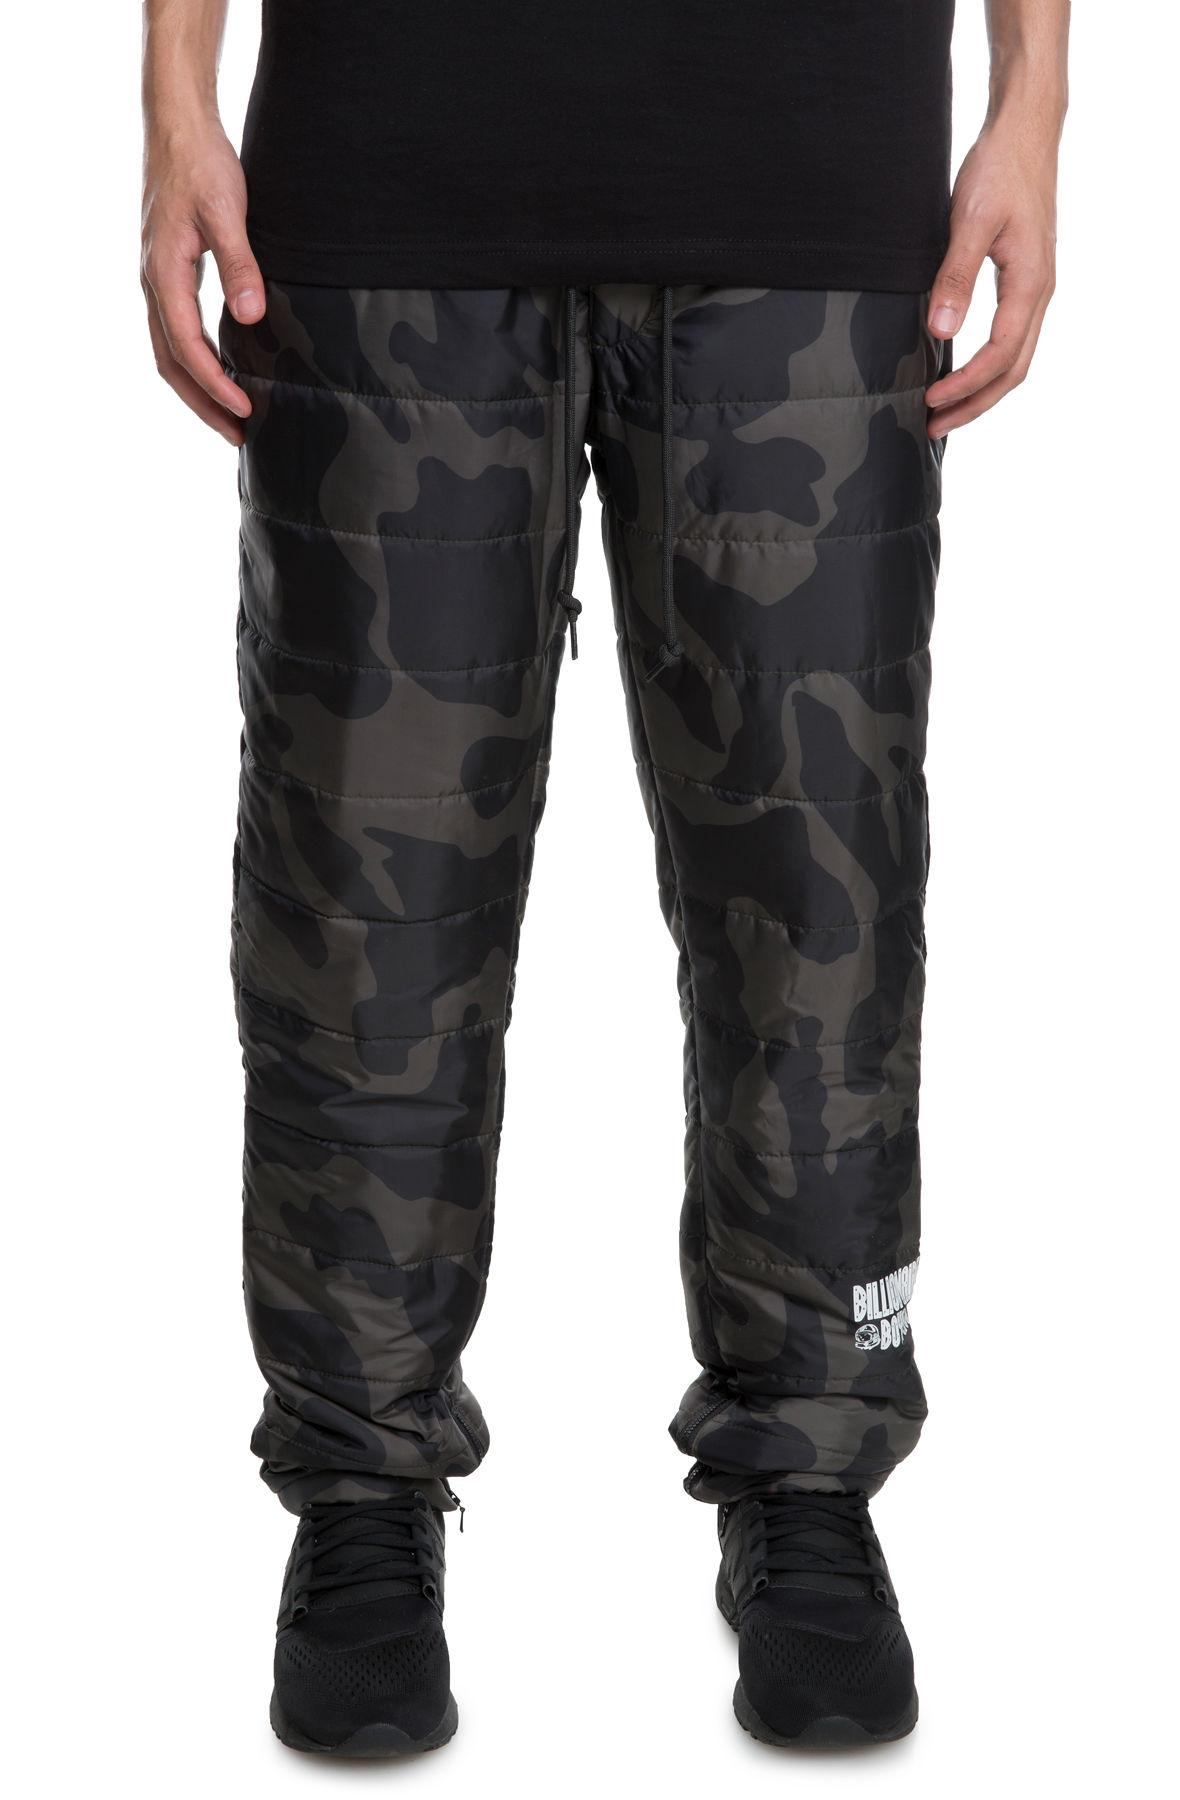 Image of The BB Legend Pants in Beluga